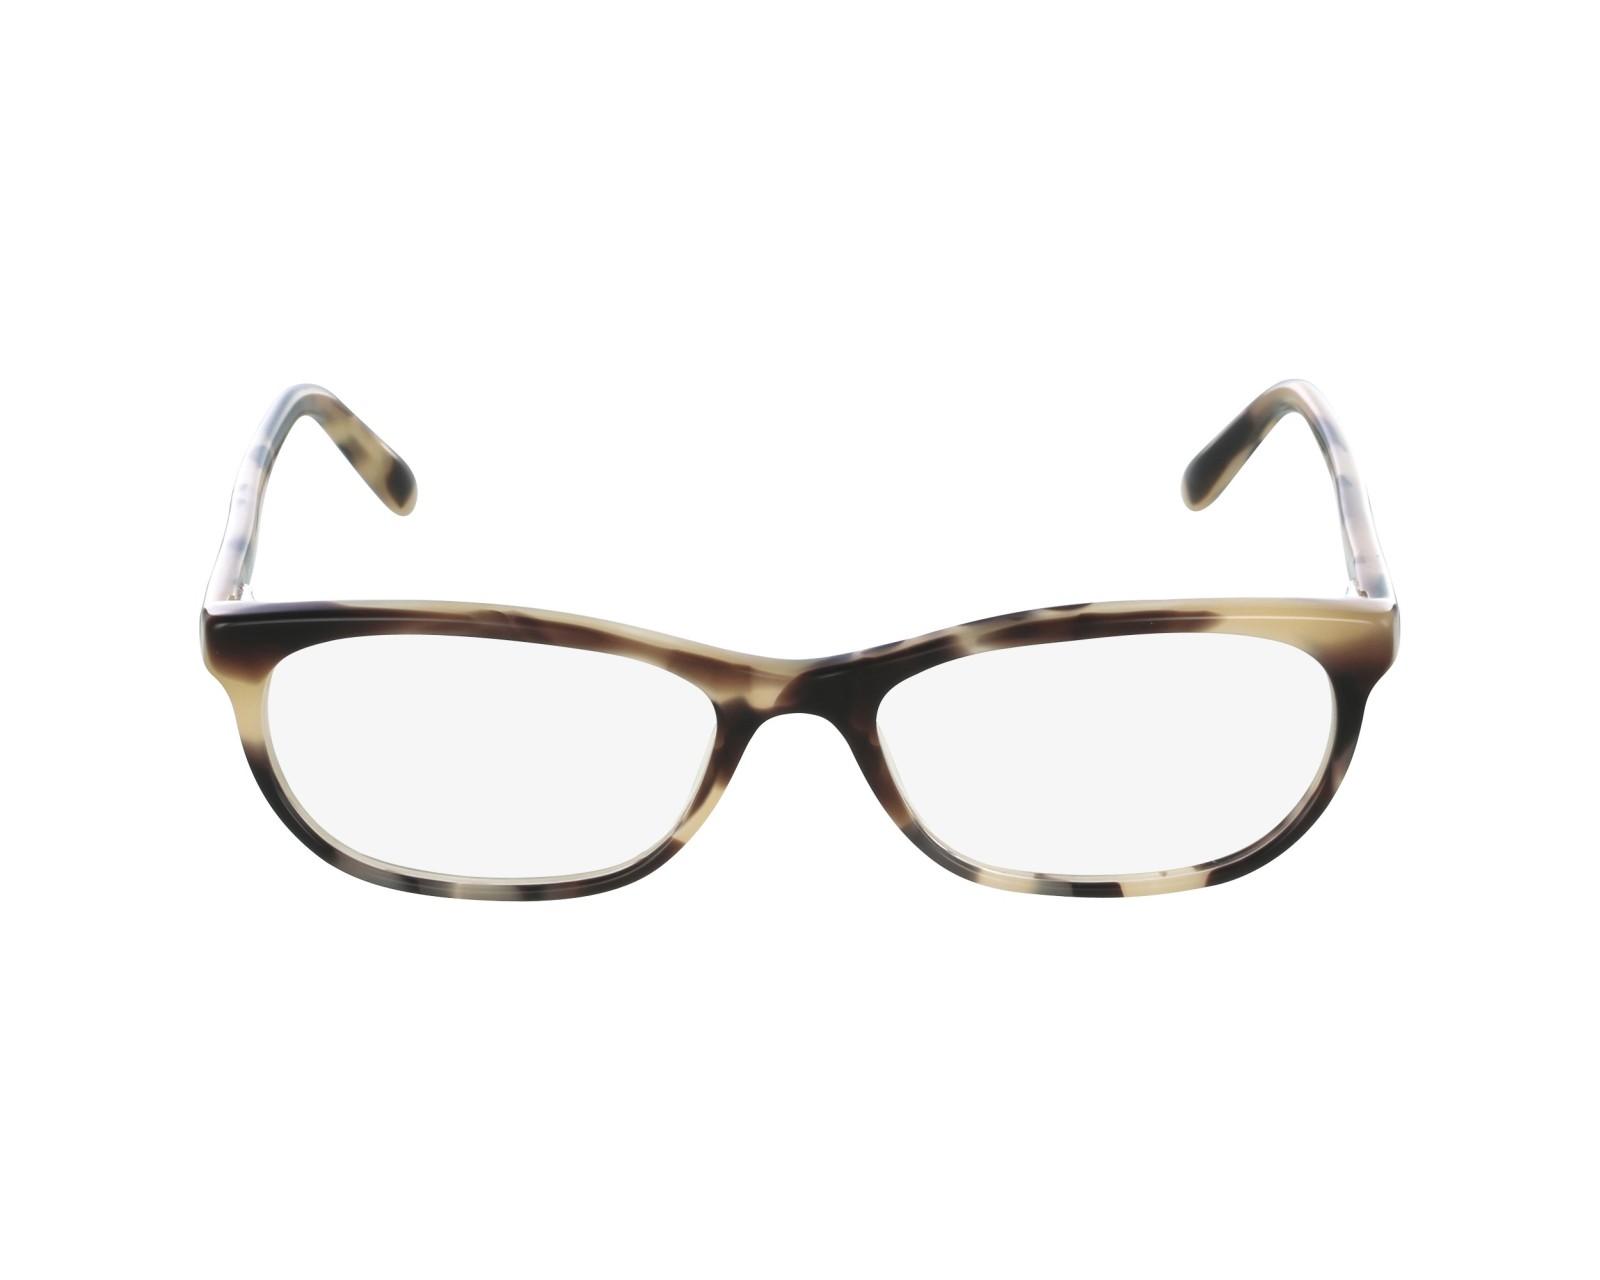 261d9e70e9 eyeglasses Burberry BE-2180 3501 - Havana profile view